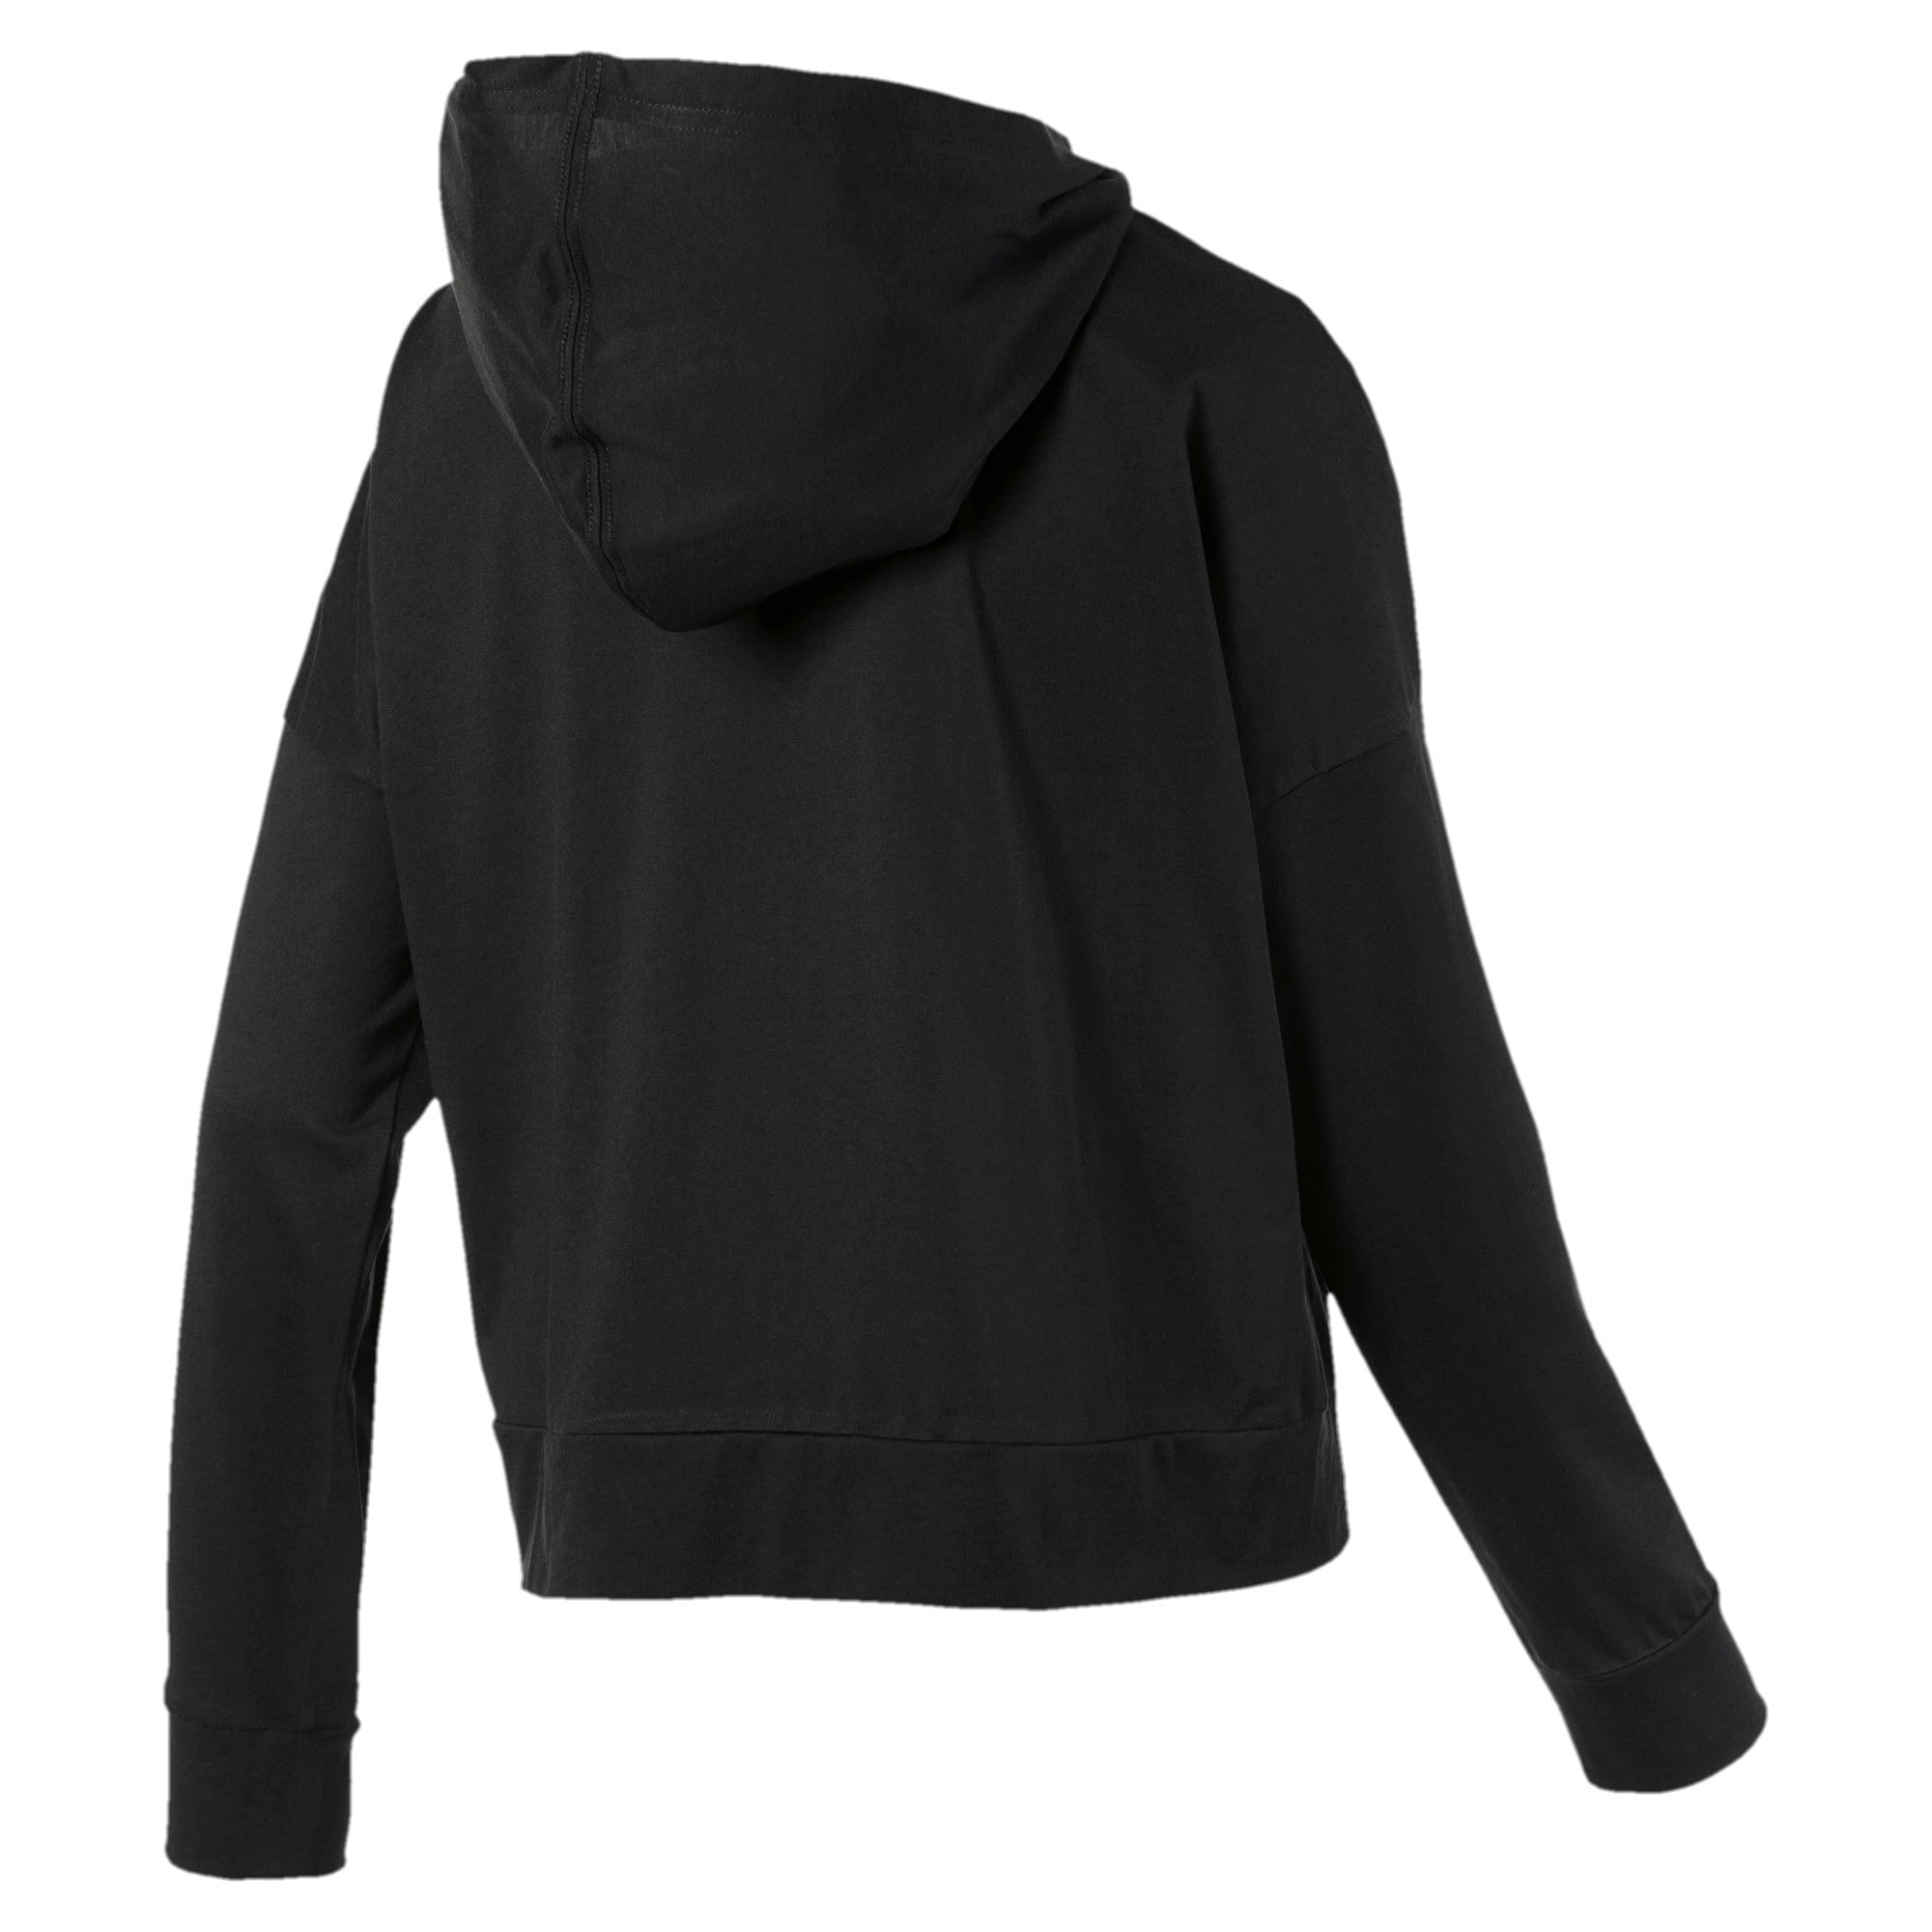 Thumbnail 5 of Modern Sport Long Sleeve Women's Hoodie, Puma Black, medium-IND